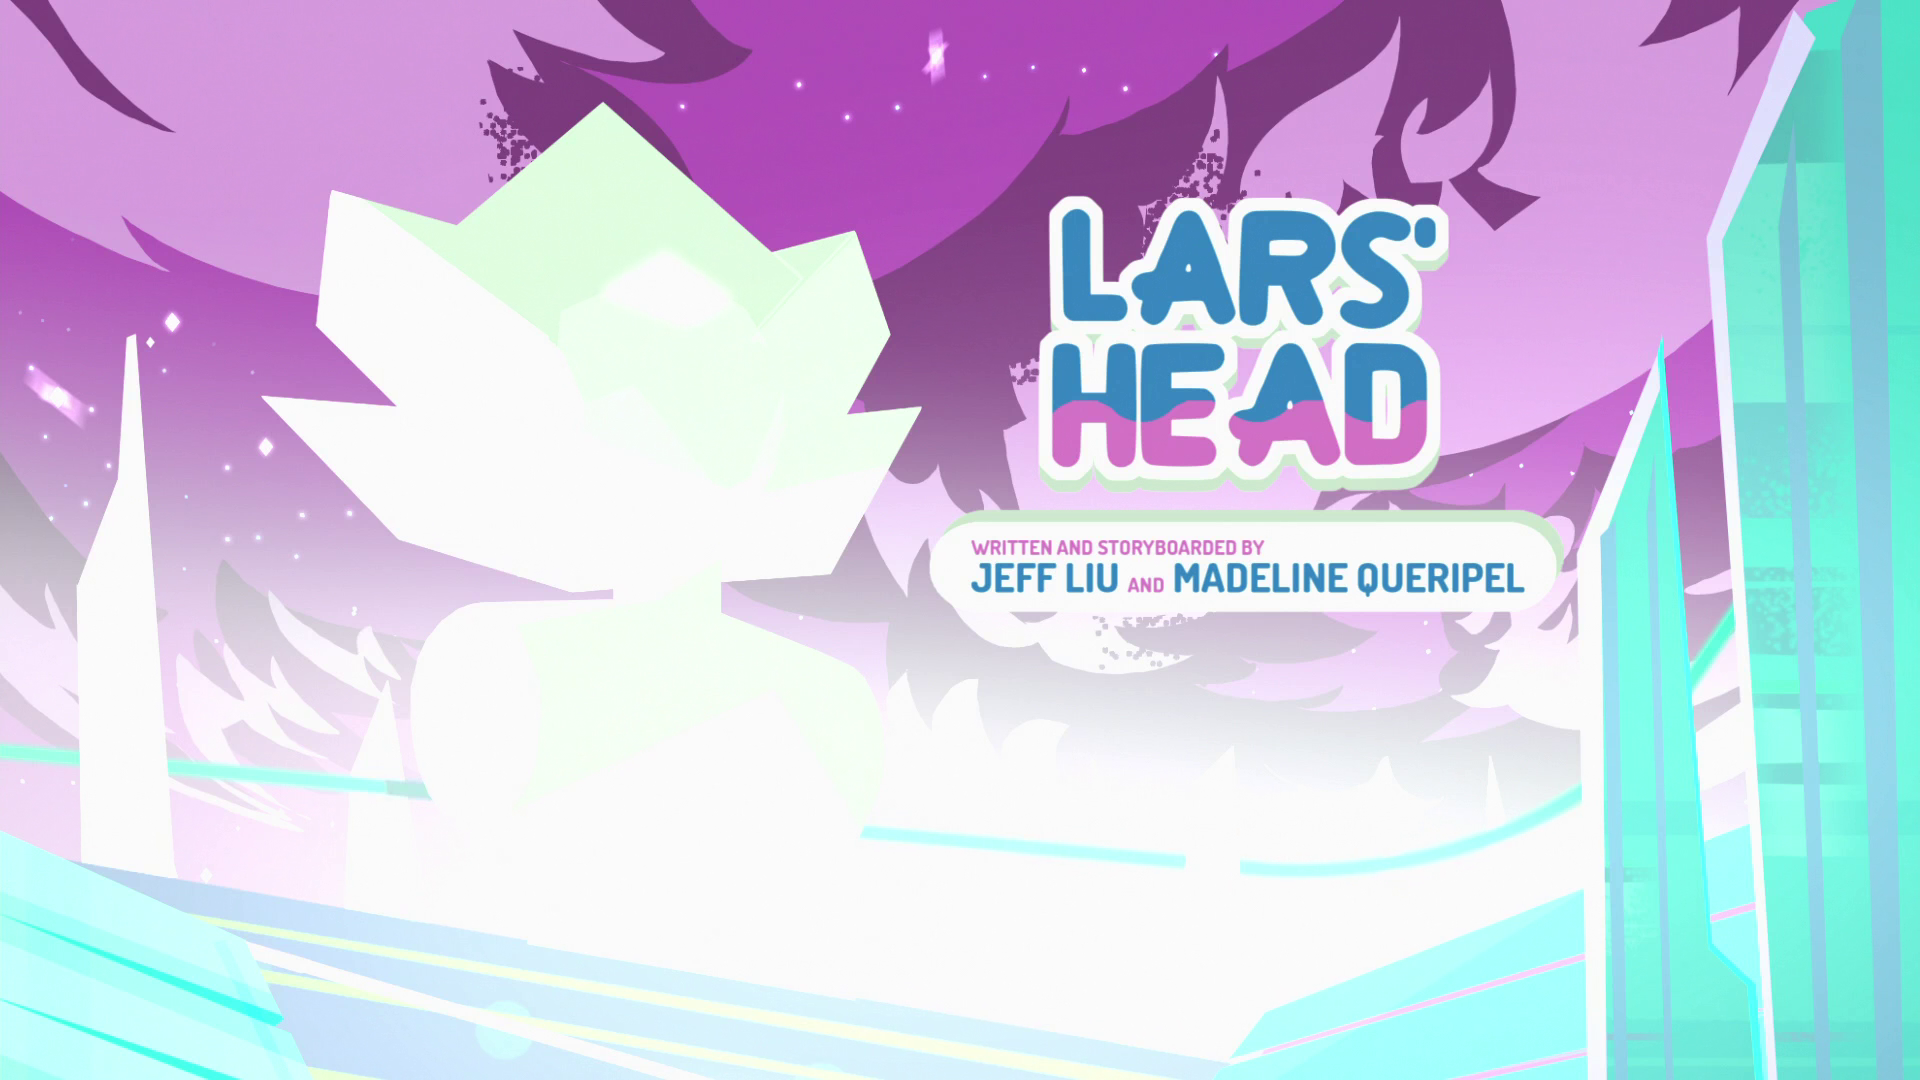 Lars' Head/Gallery